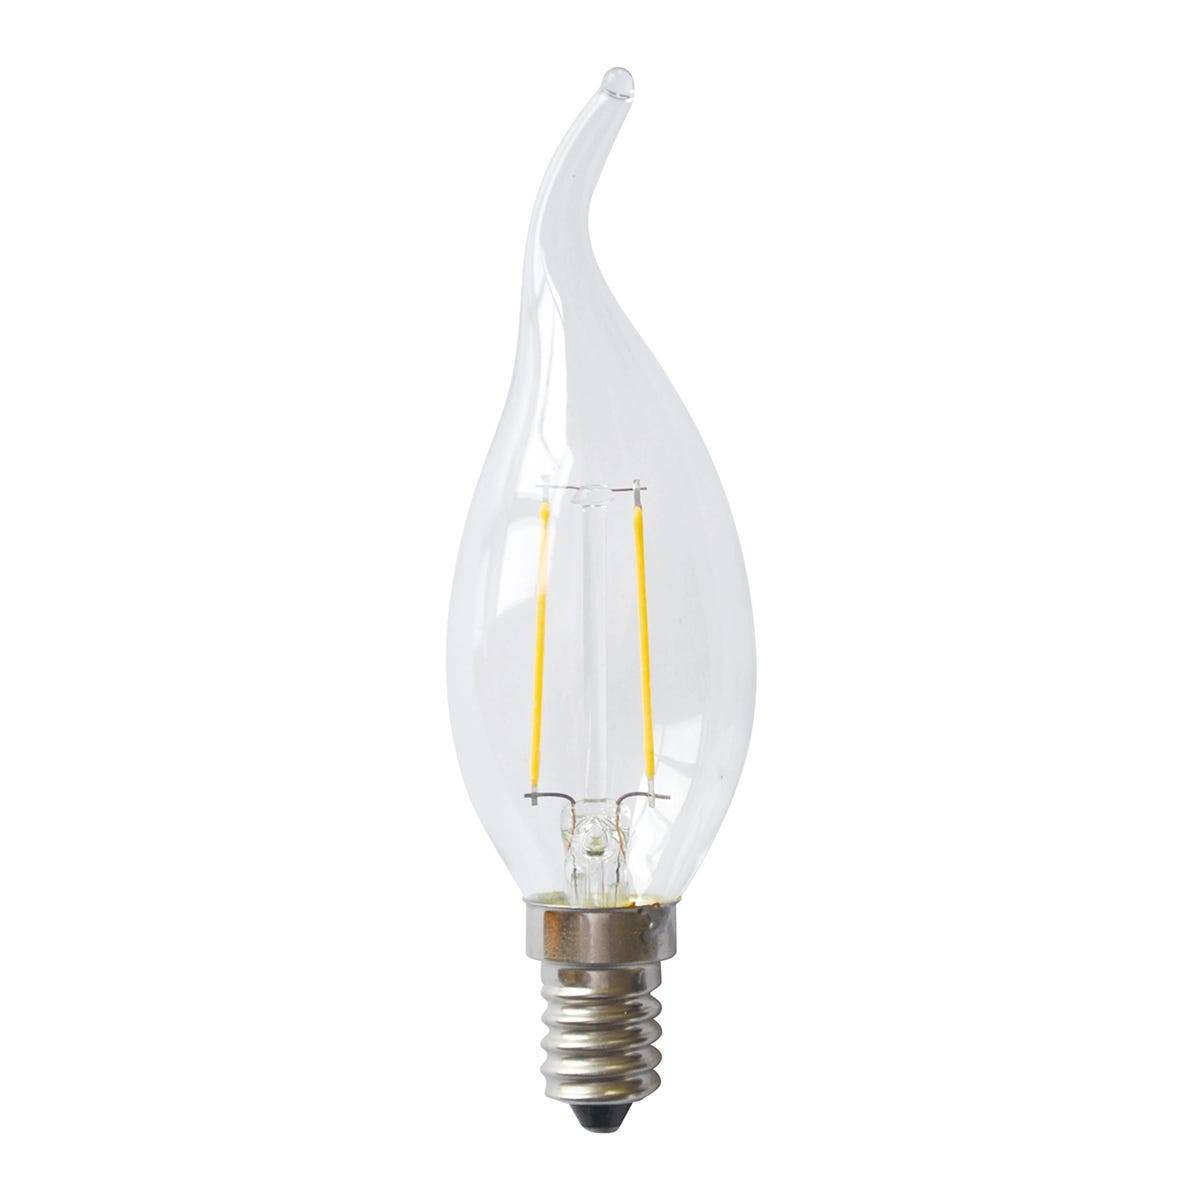 3 Lampadine Vivida Led Fiamma E14 2w=21w 220 Lumen 3000k Luce Calda  Ø35x120 Mm